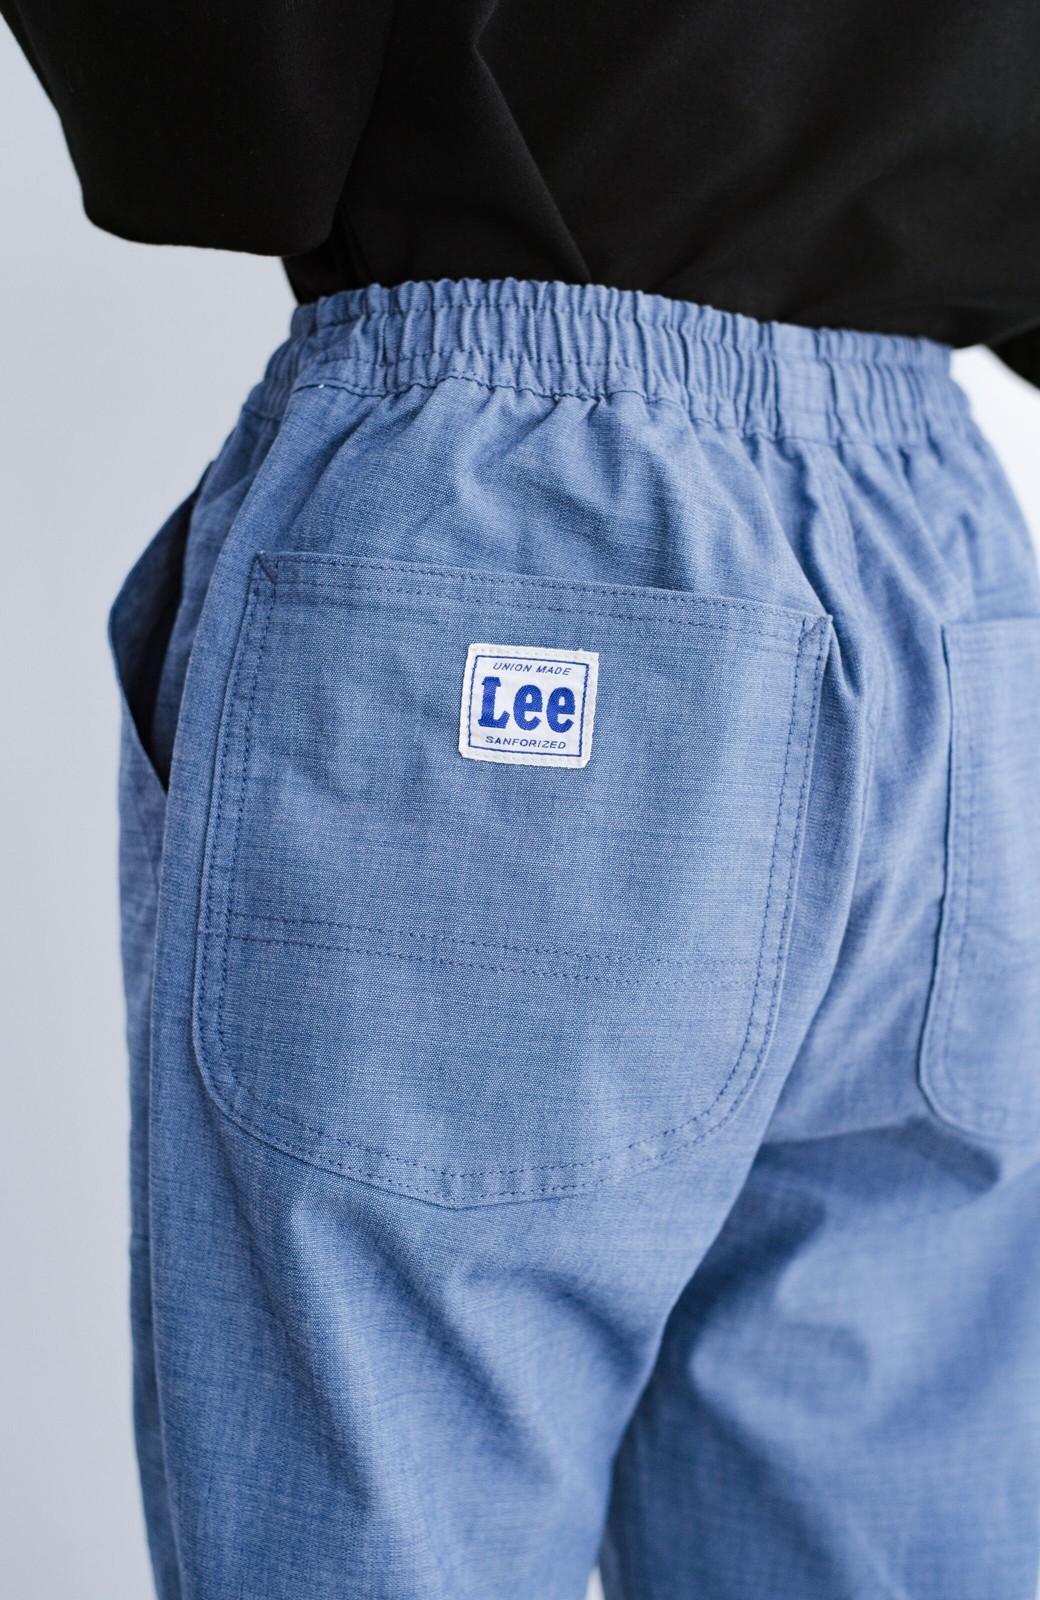 haco! Lady Lee シャンブレー素材のらくちんイージーパンツ <ブルー>の商品写真6